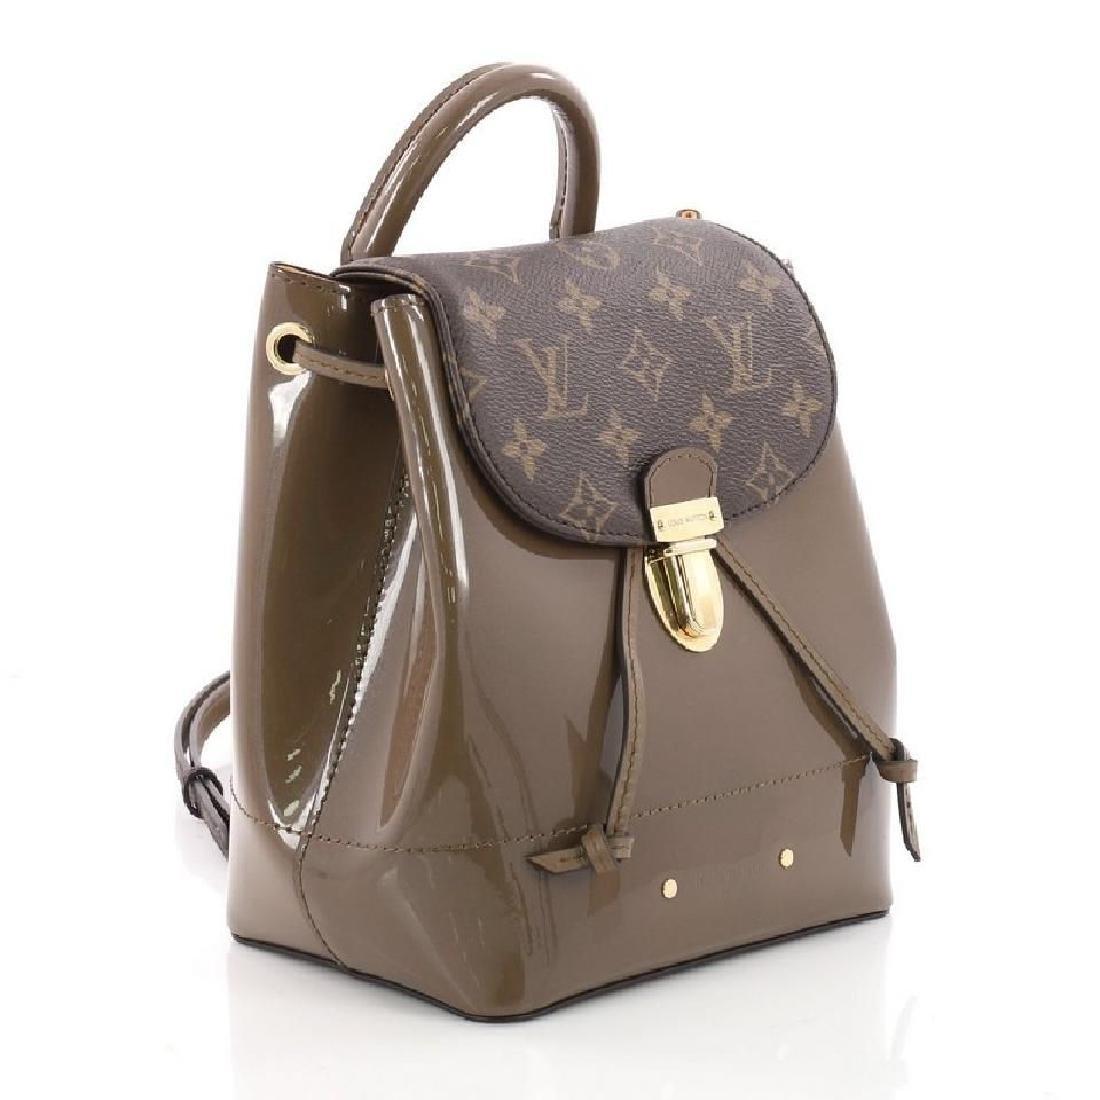 Louis Vuitton Hot Springs Vernis Monogram Backpack